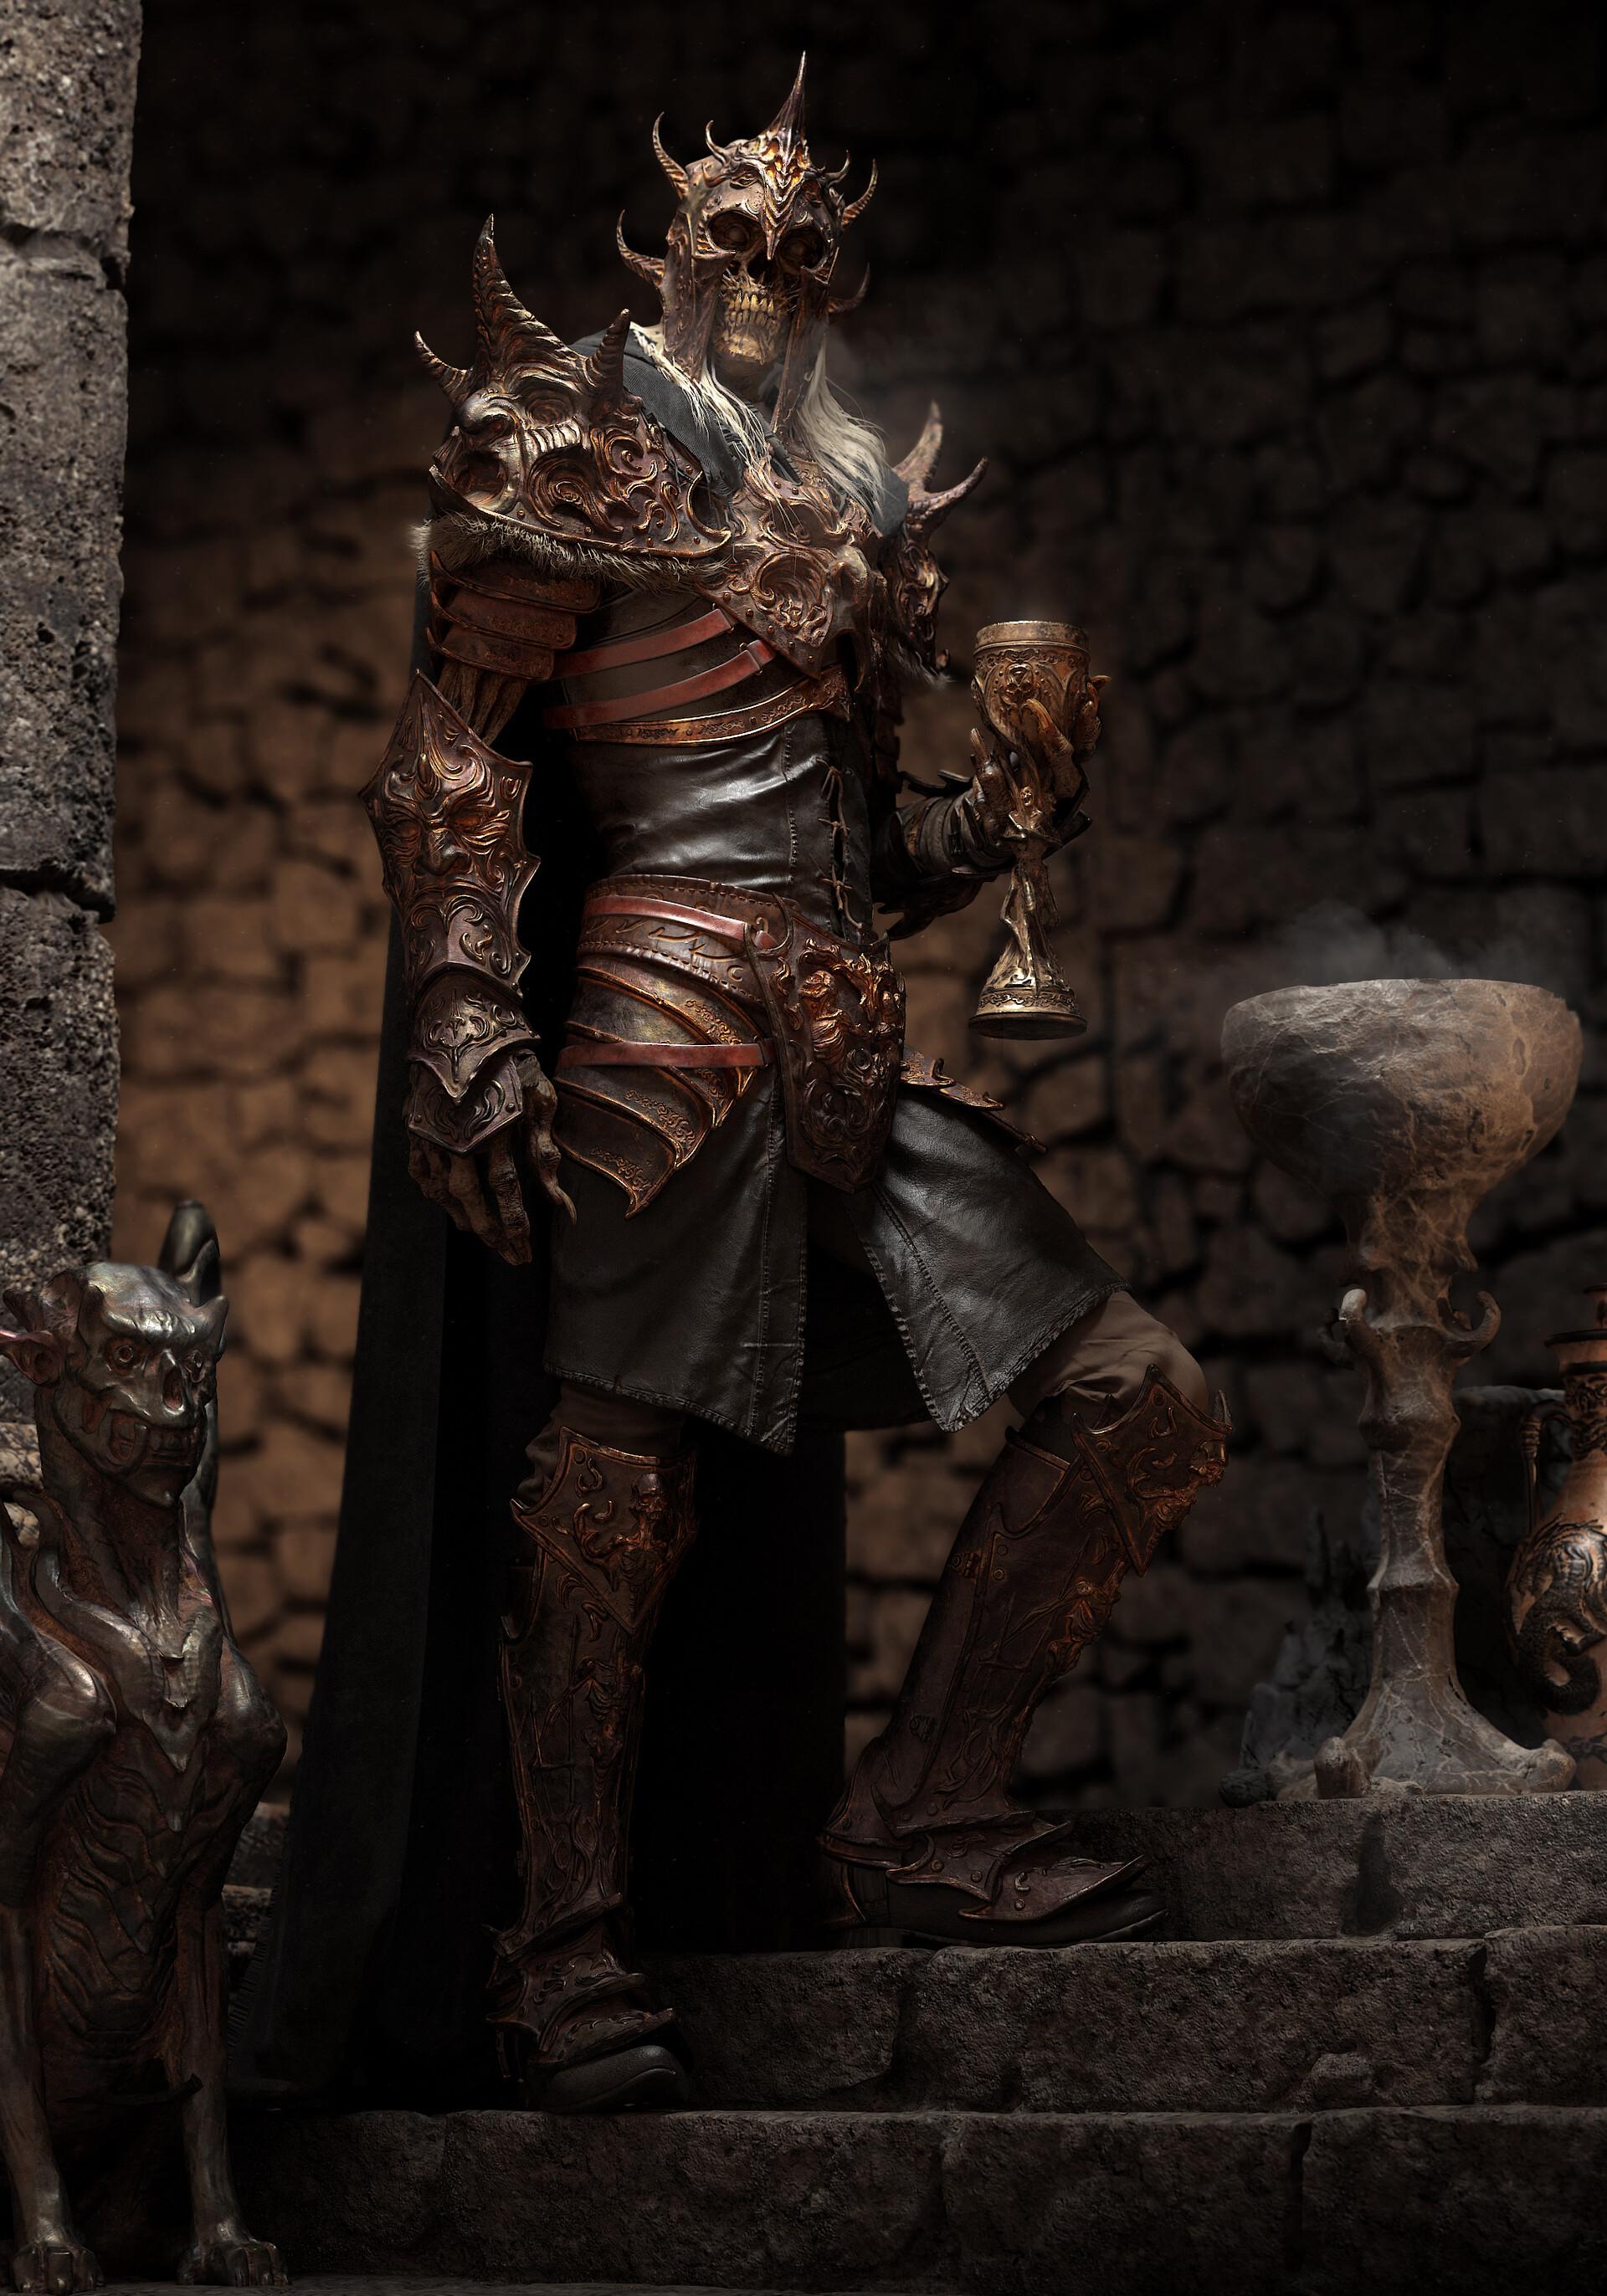 Bruno camara undex warlord bruno camara 08